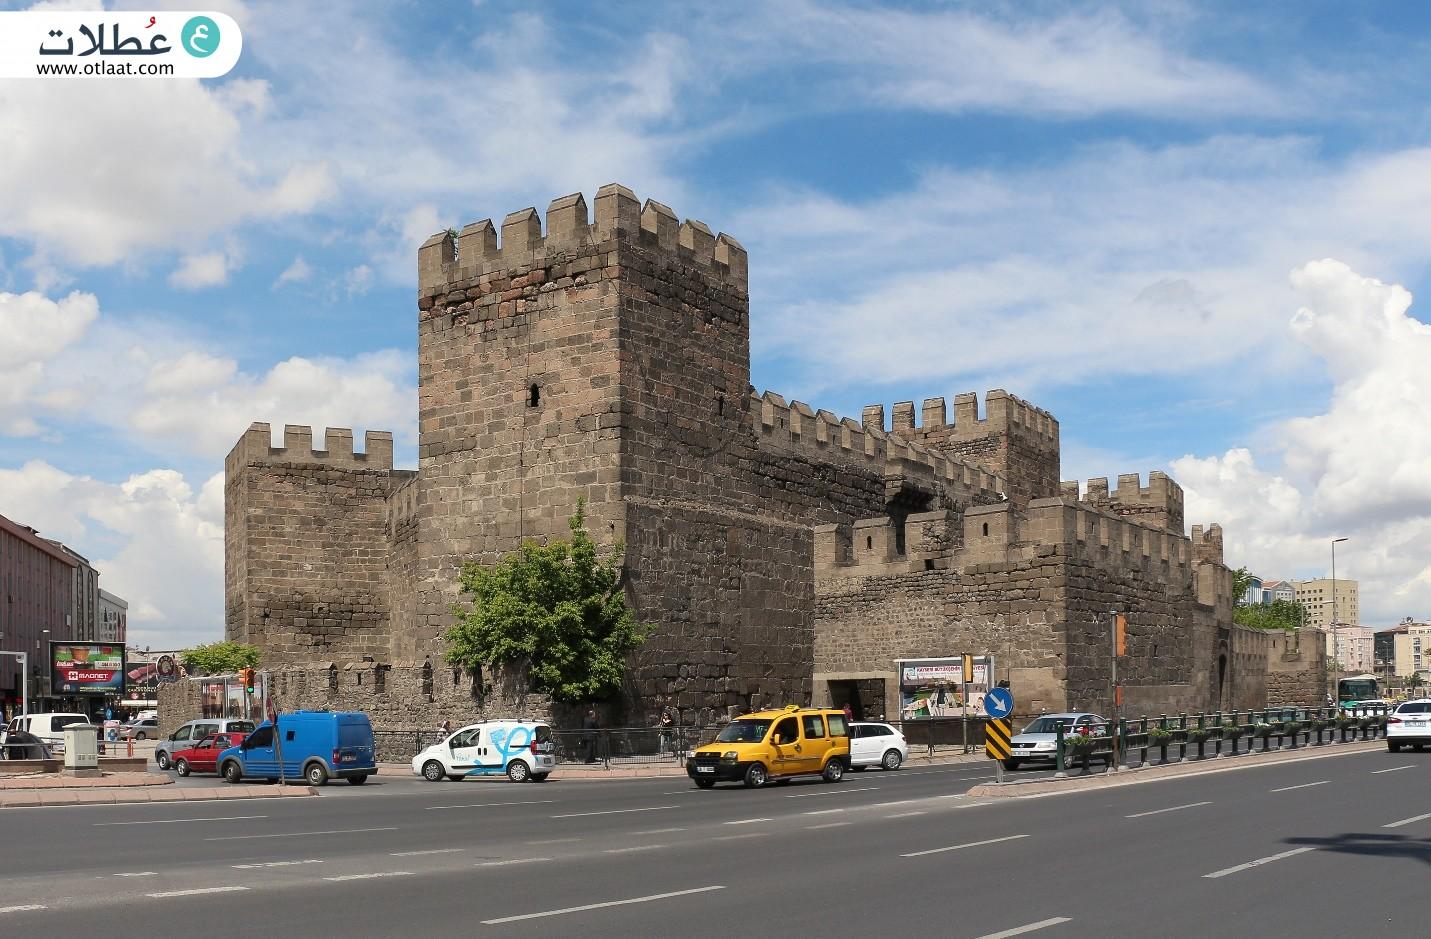 تقرير مدينة قيصري قلعة قيصري